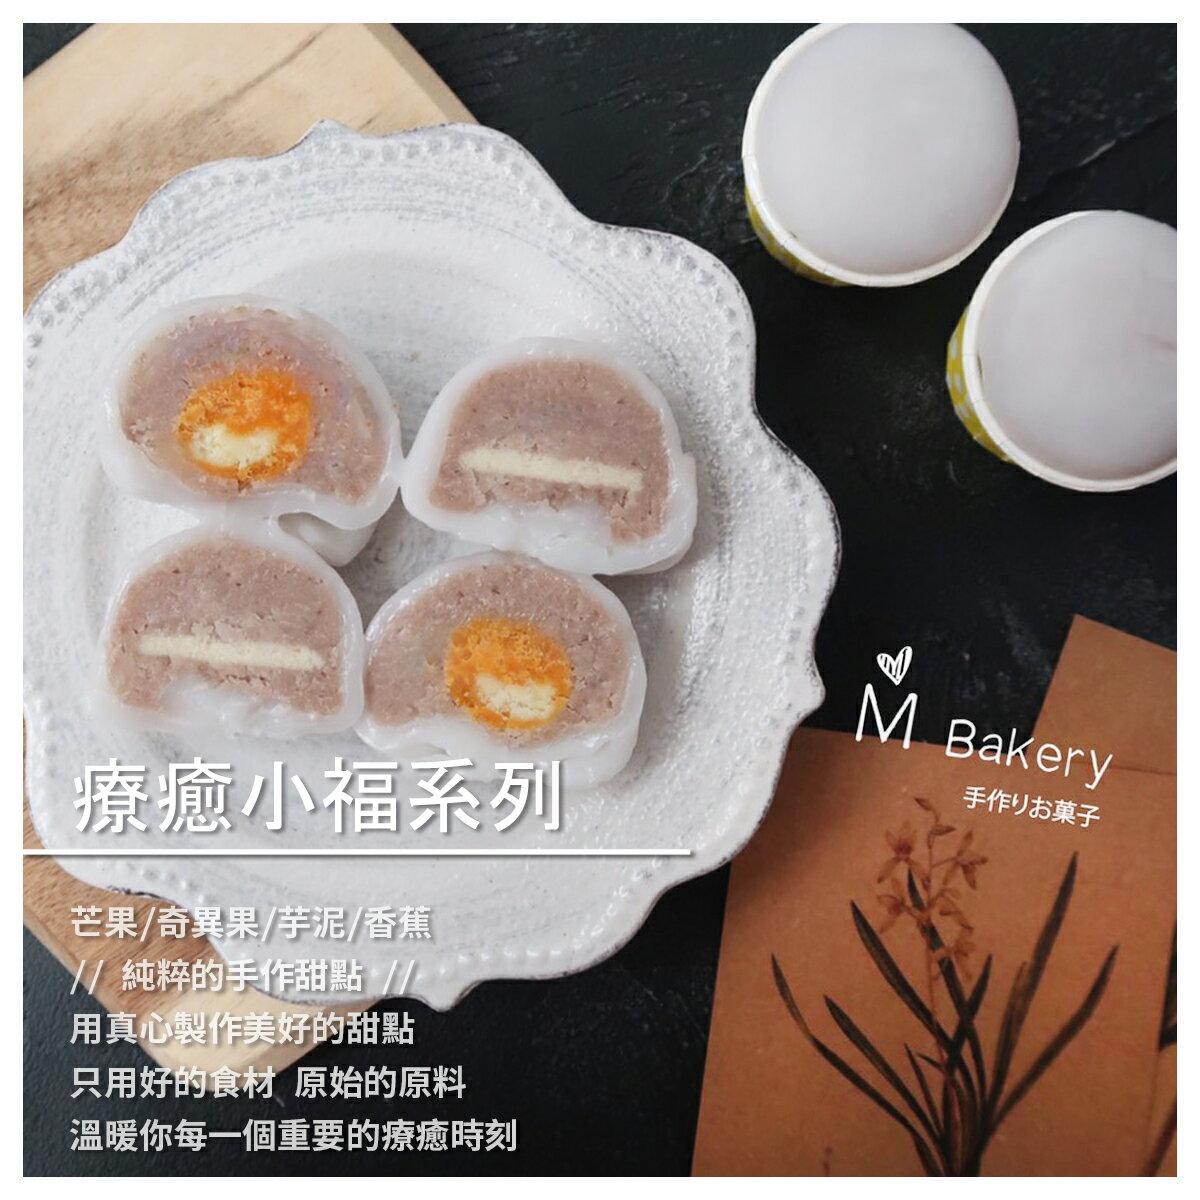 【M Bakery 手作菓子】療癒小福系列/5款口味/9入